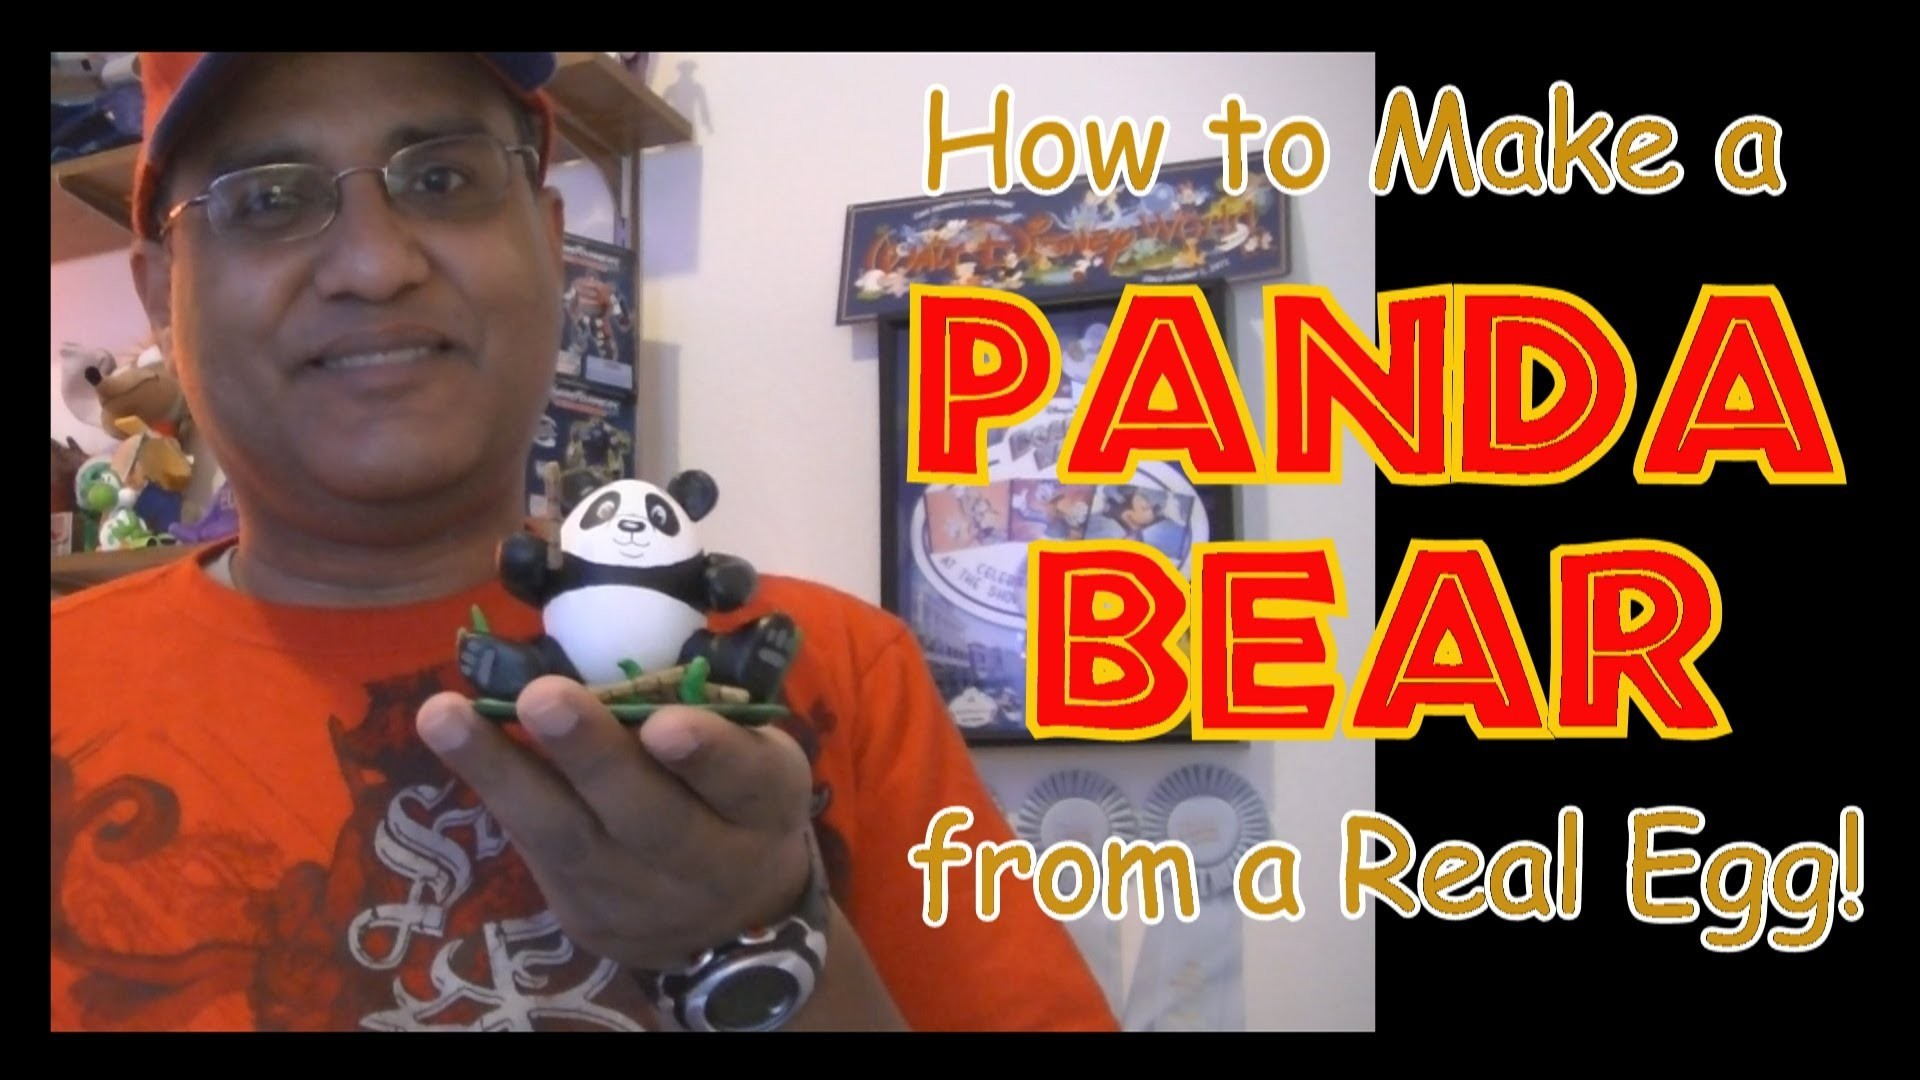 How to make a Panda Bear Egg for Easter